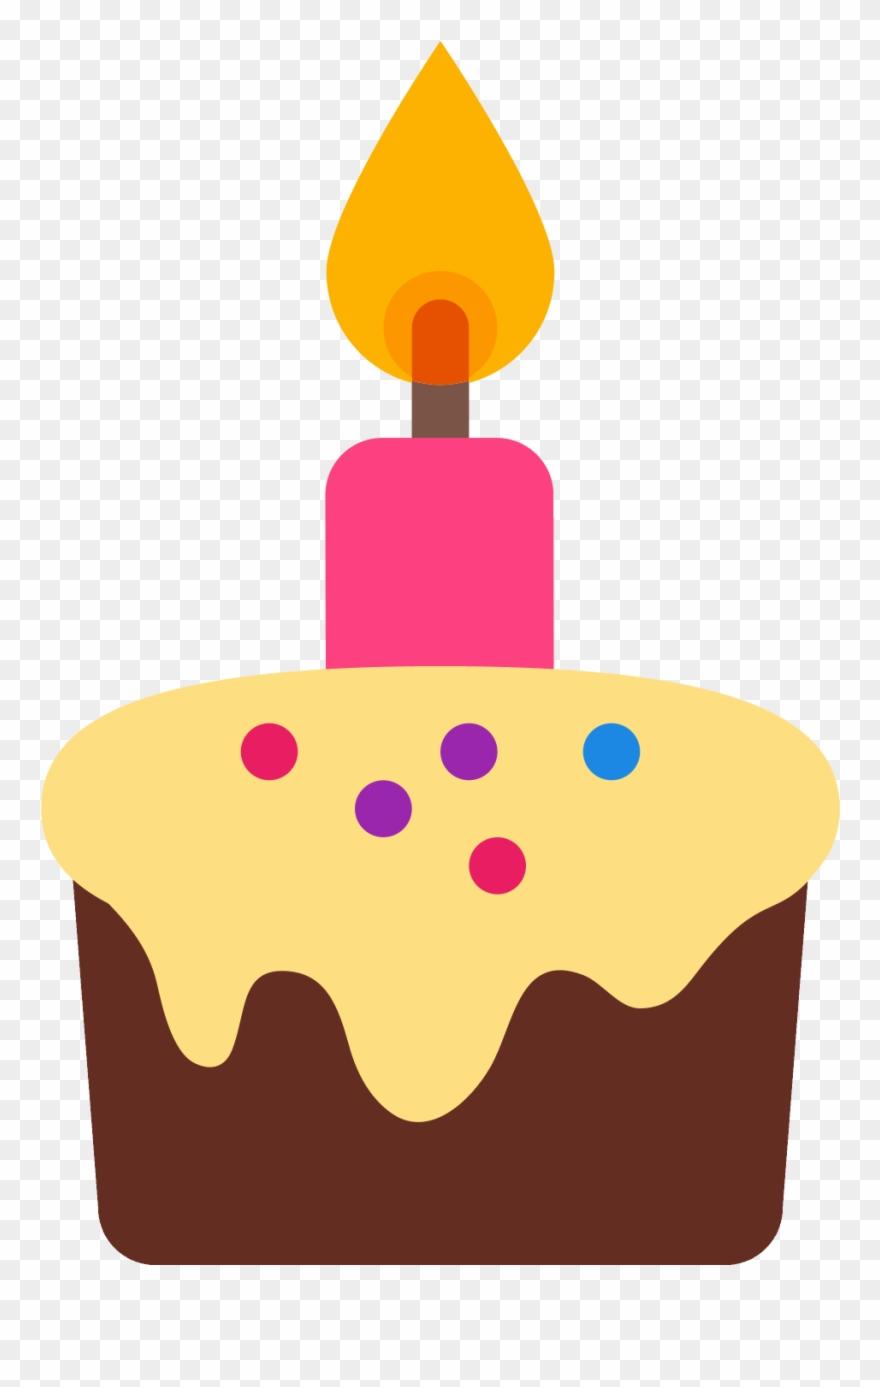 Dessert clipart easter. Birthday cake pdf png